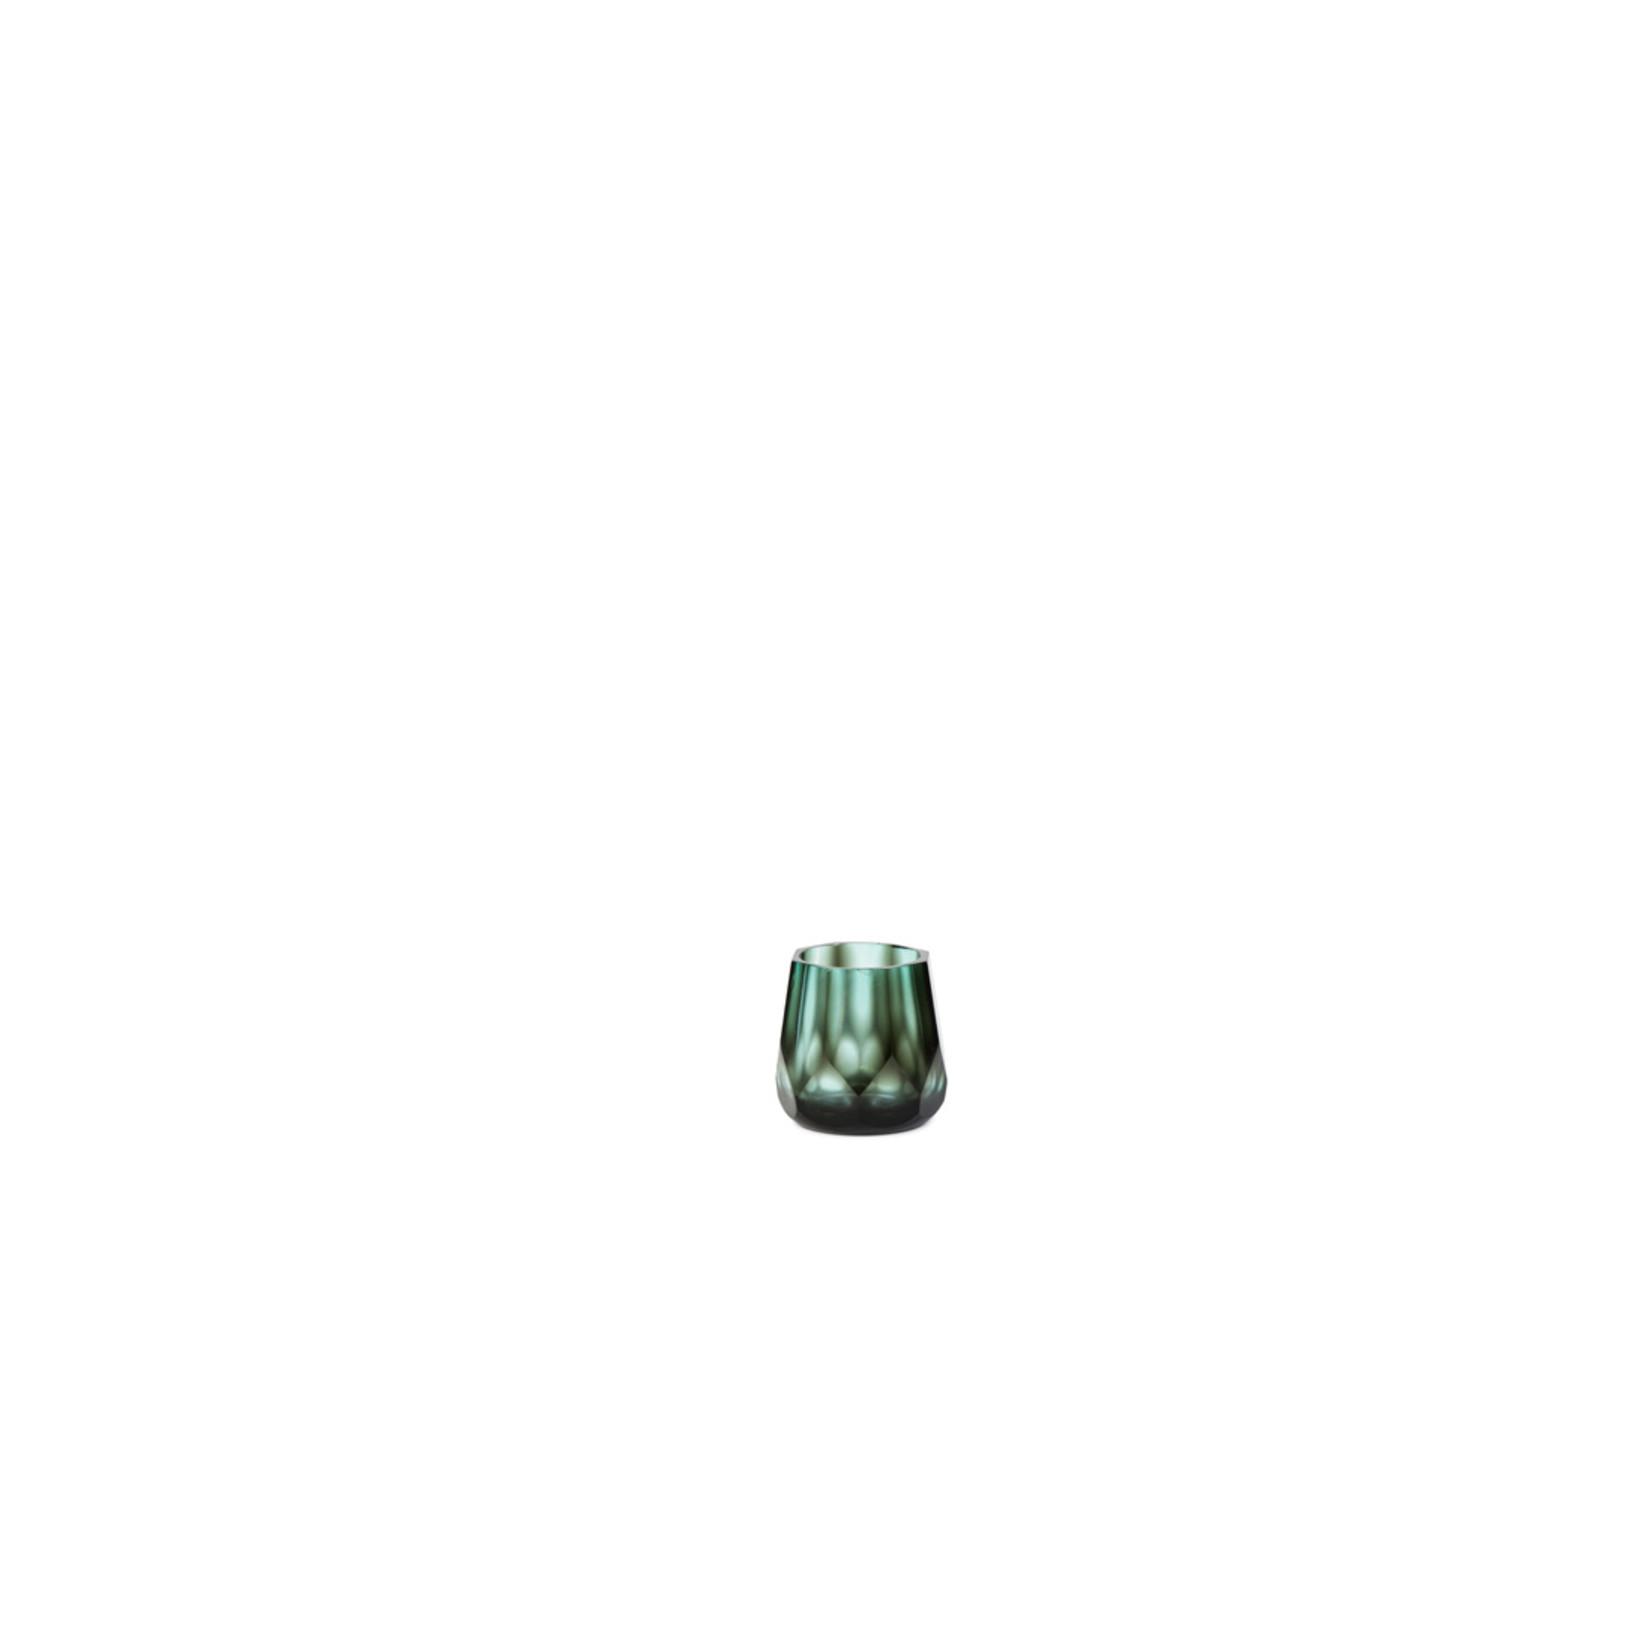 T-Light Holder Faceted | Gray / Aqua